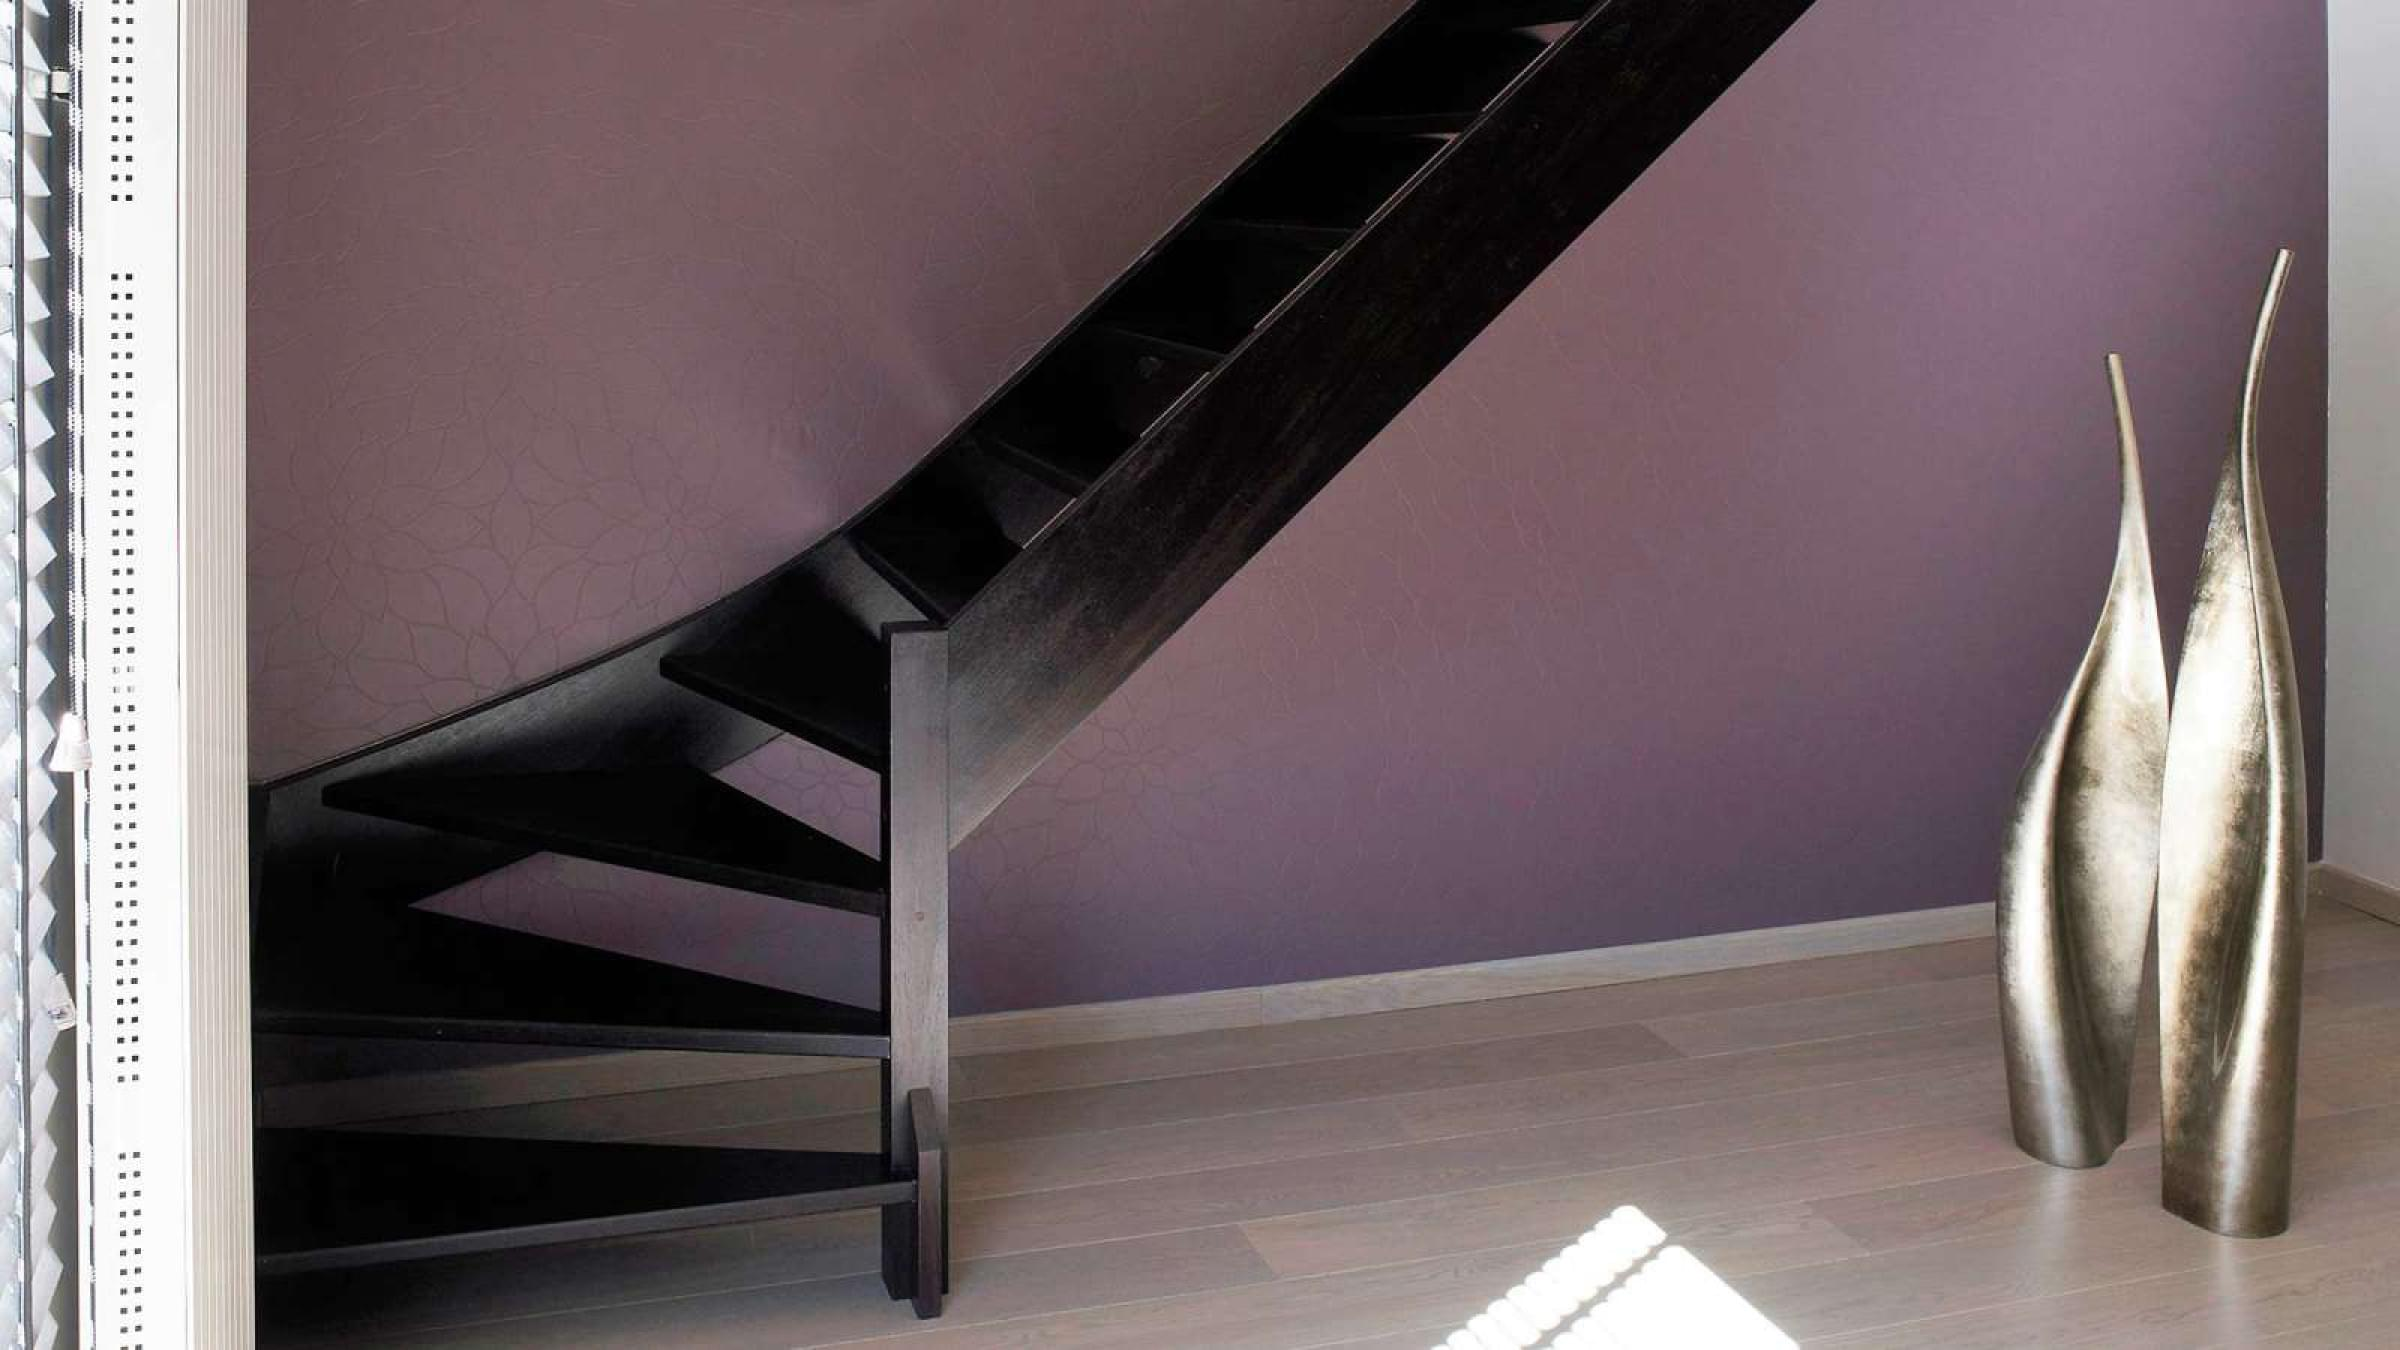 nordex-trappen-interieurobject-2400